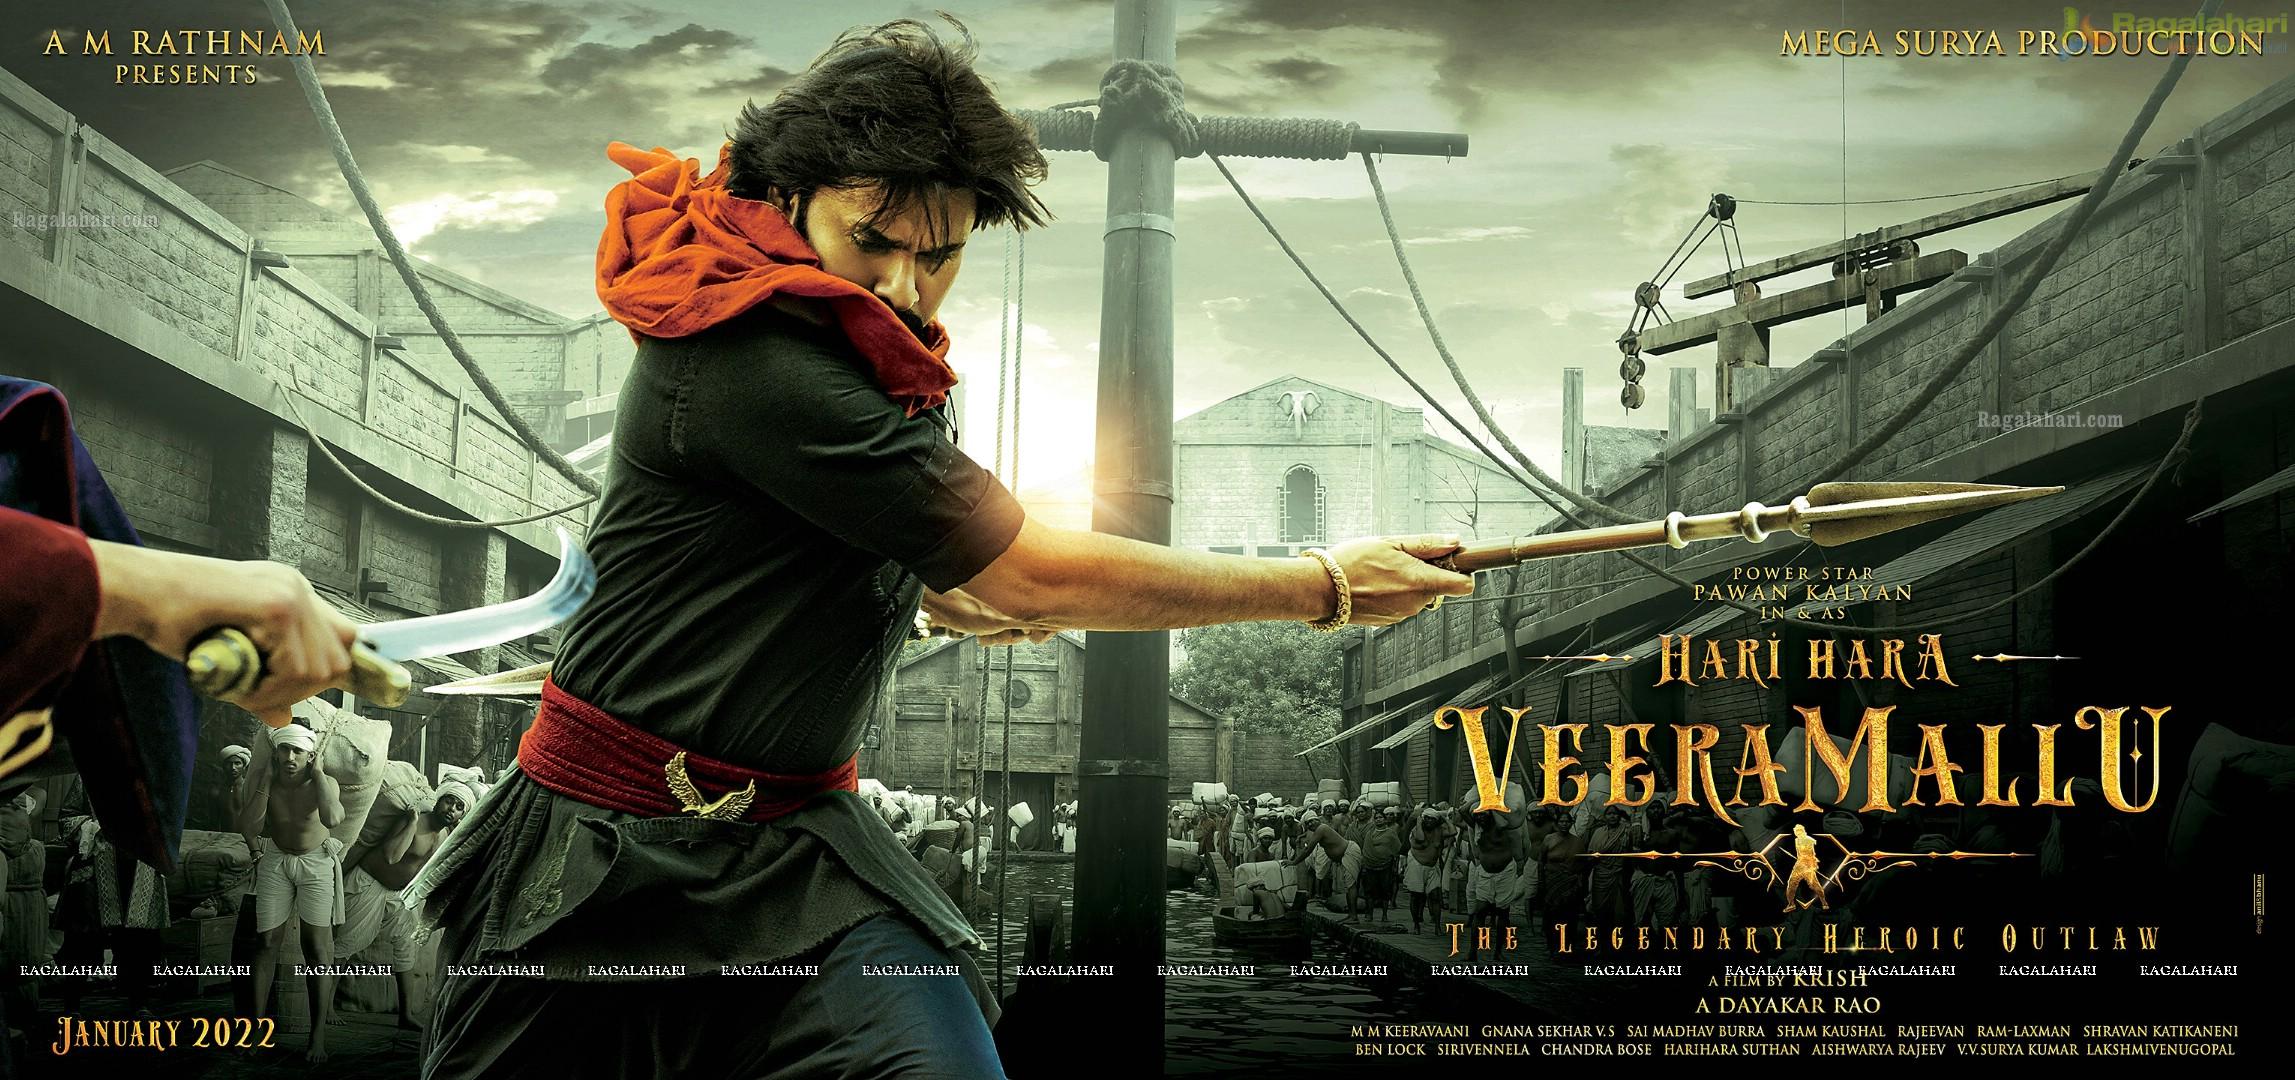 Hari Hara Veera Mallu Release Date Poster Design, English